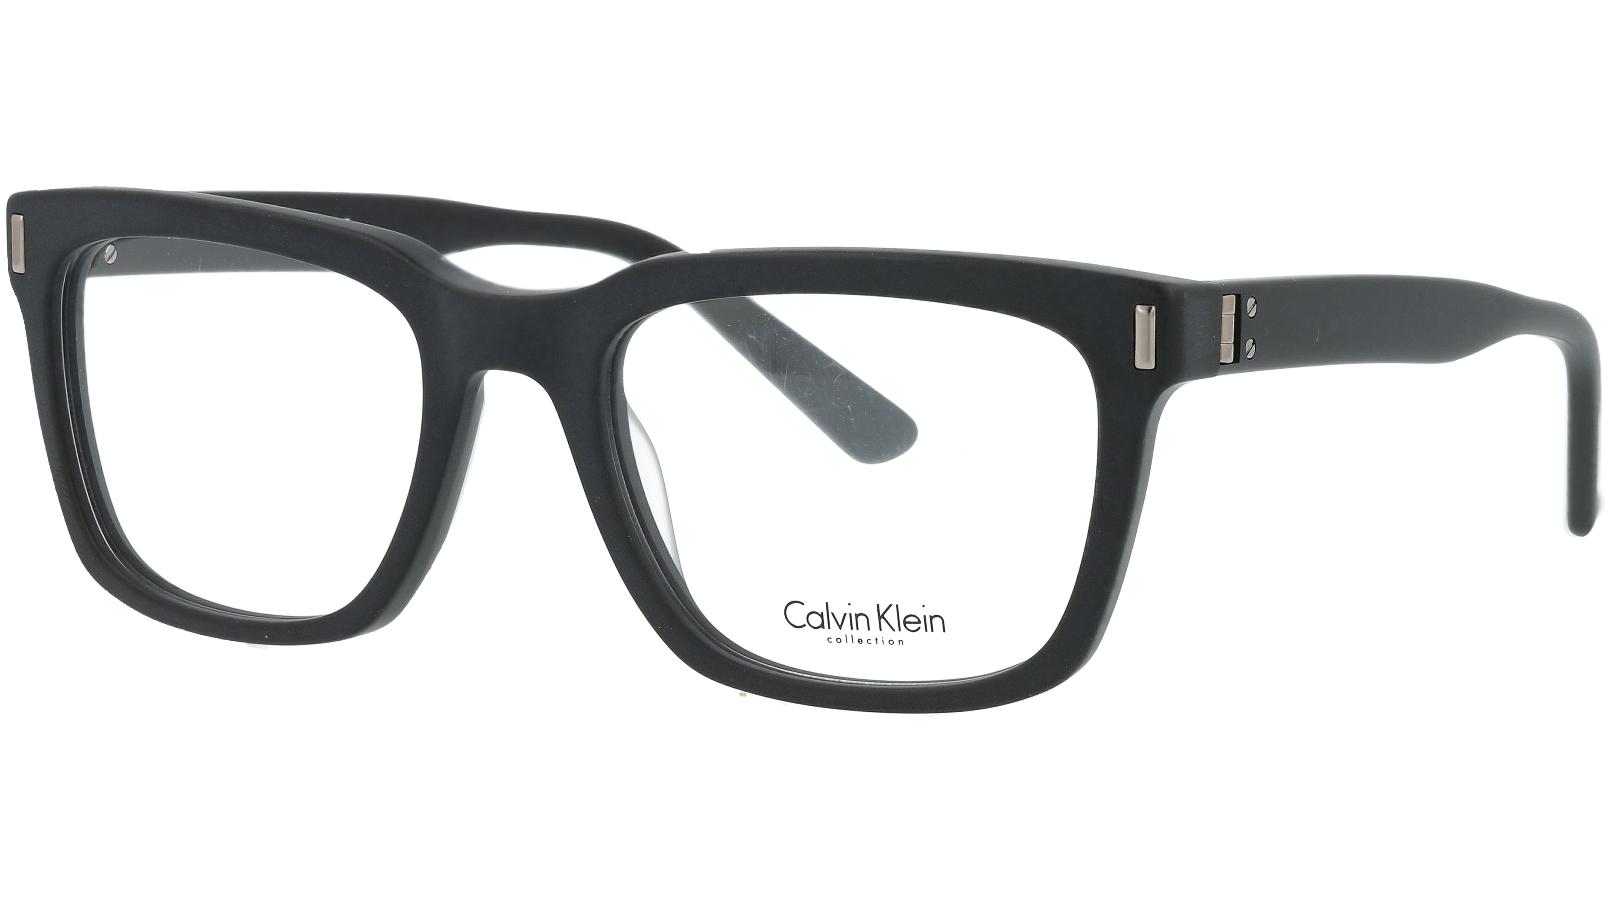 Calvin Klein CK8518 007 52 MATT Glasses